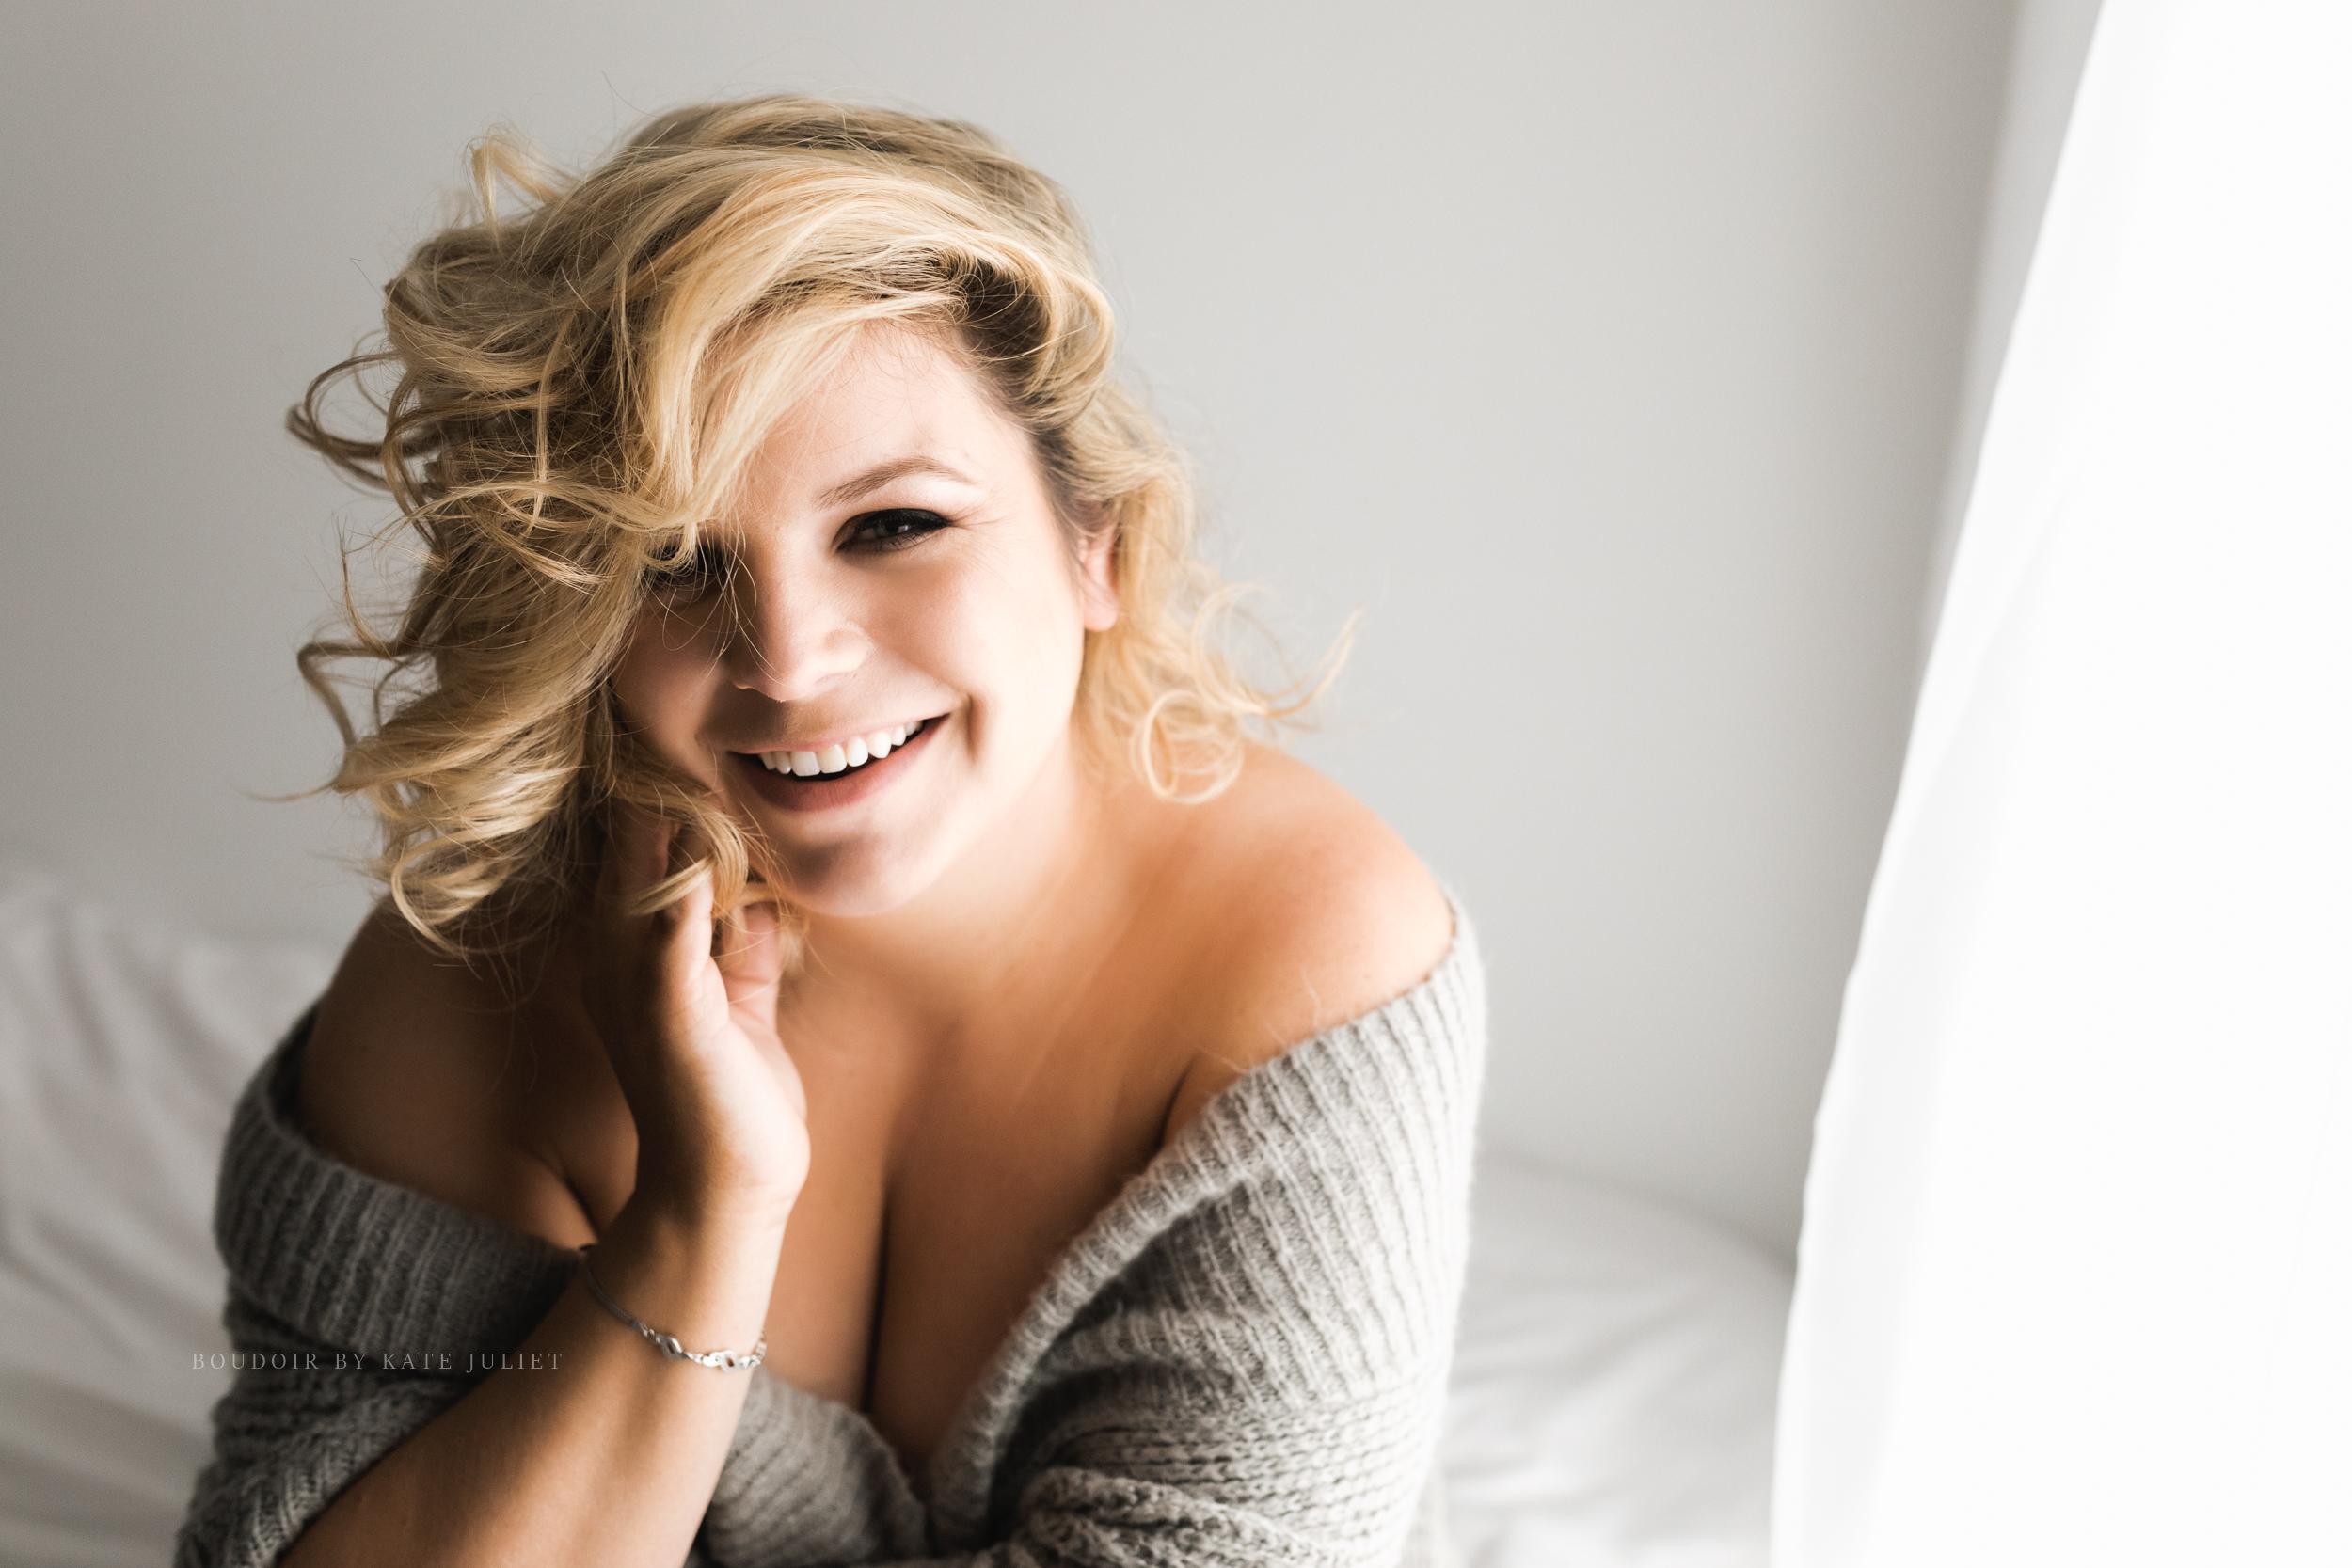 Fairfax, Arlington, and Loudoun County Best Boudoir Photographer | Kate Juliet Photography